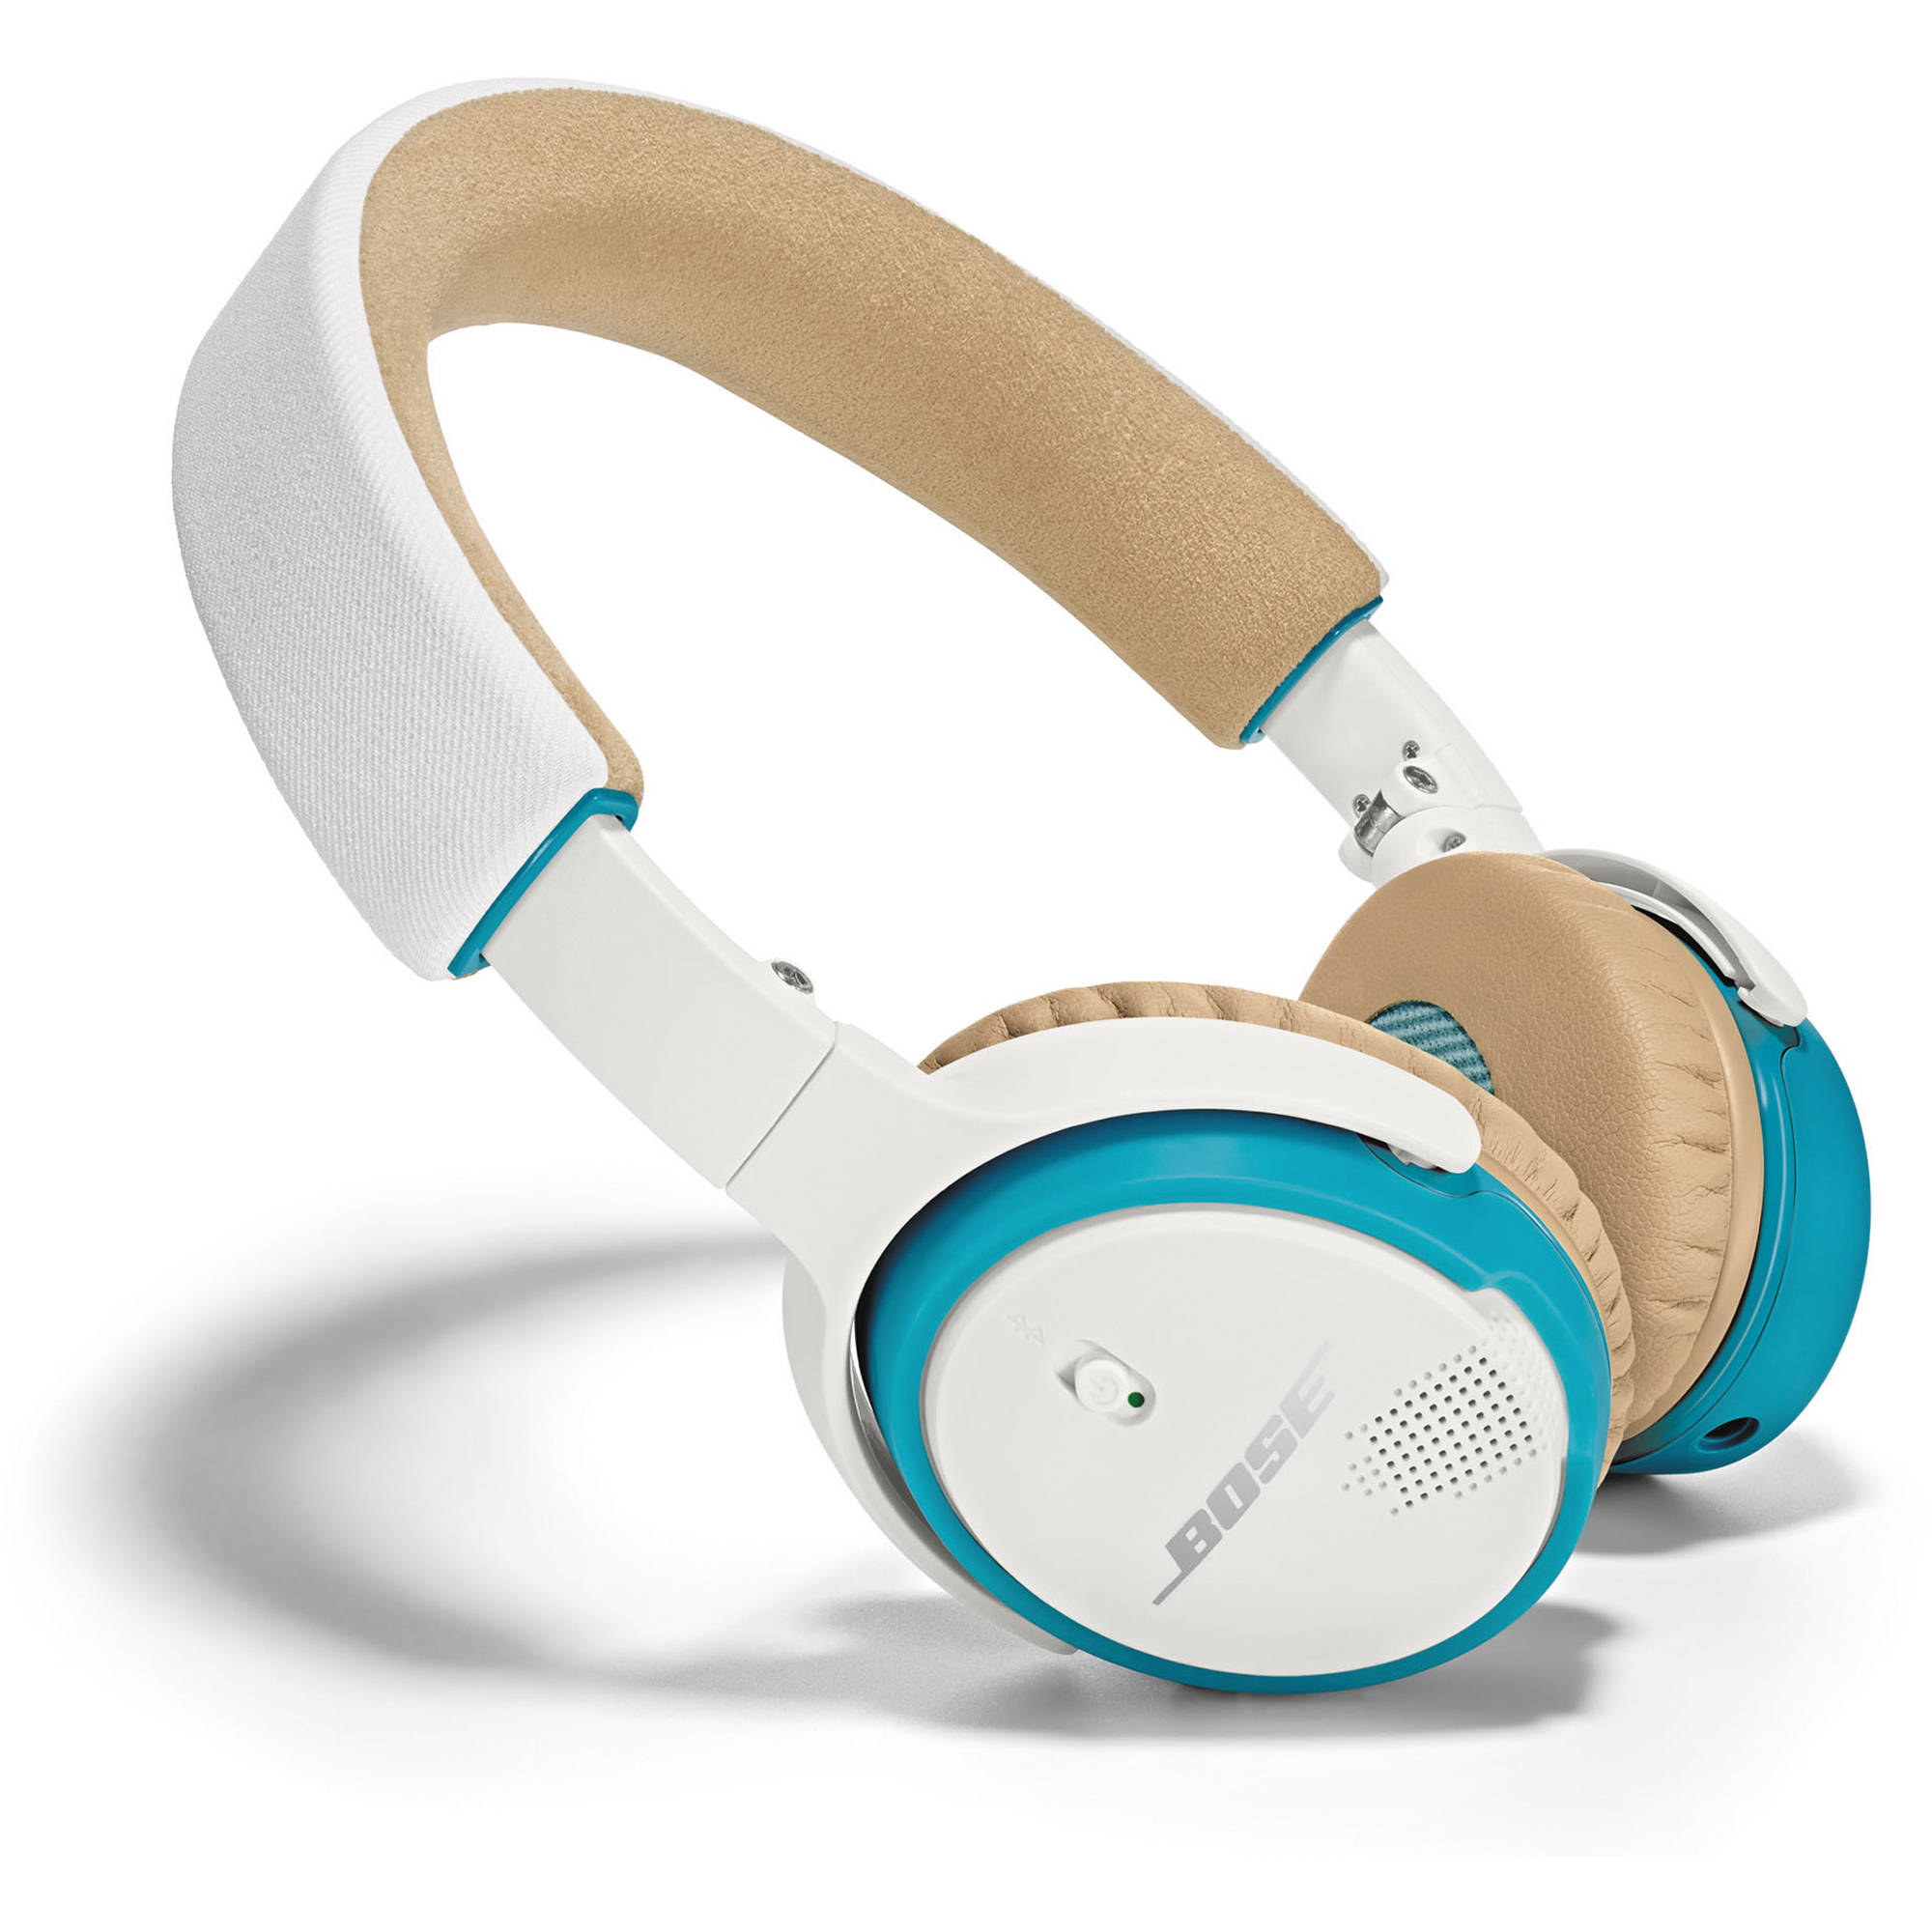 Bose SoundLink On-Ear Bluetooth Headphones 714675-0020 B&H Photo